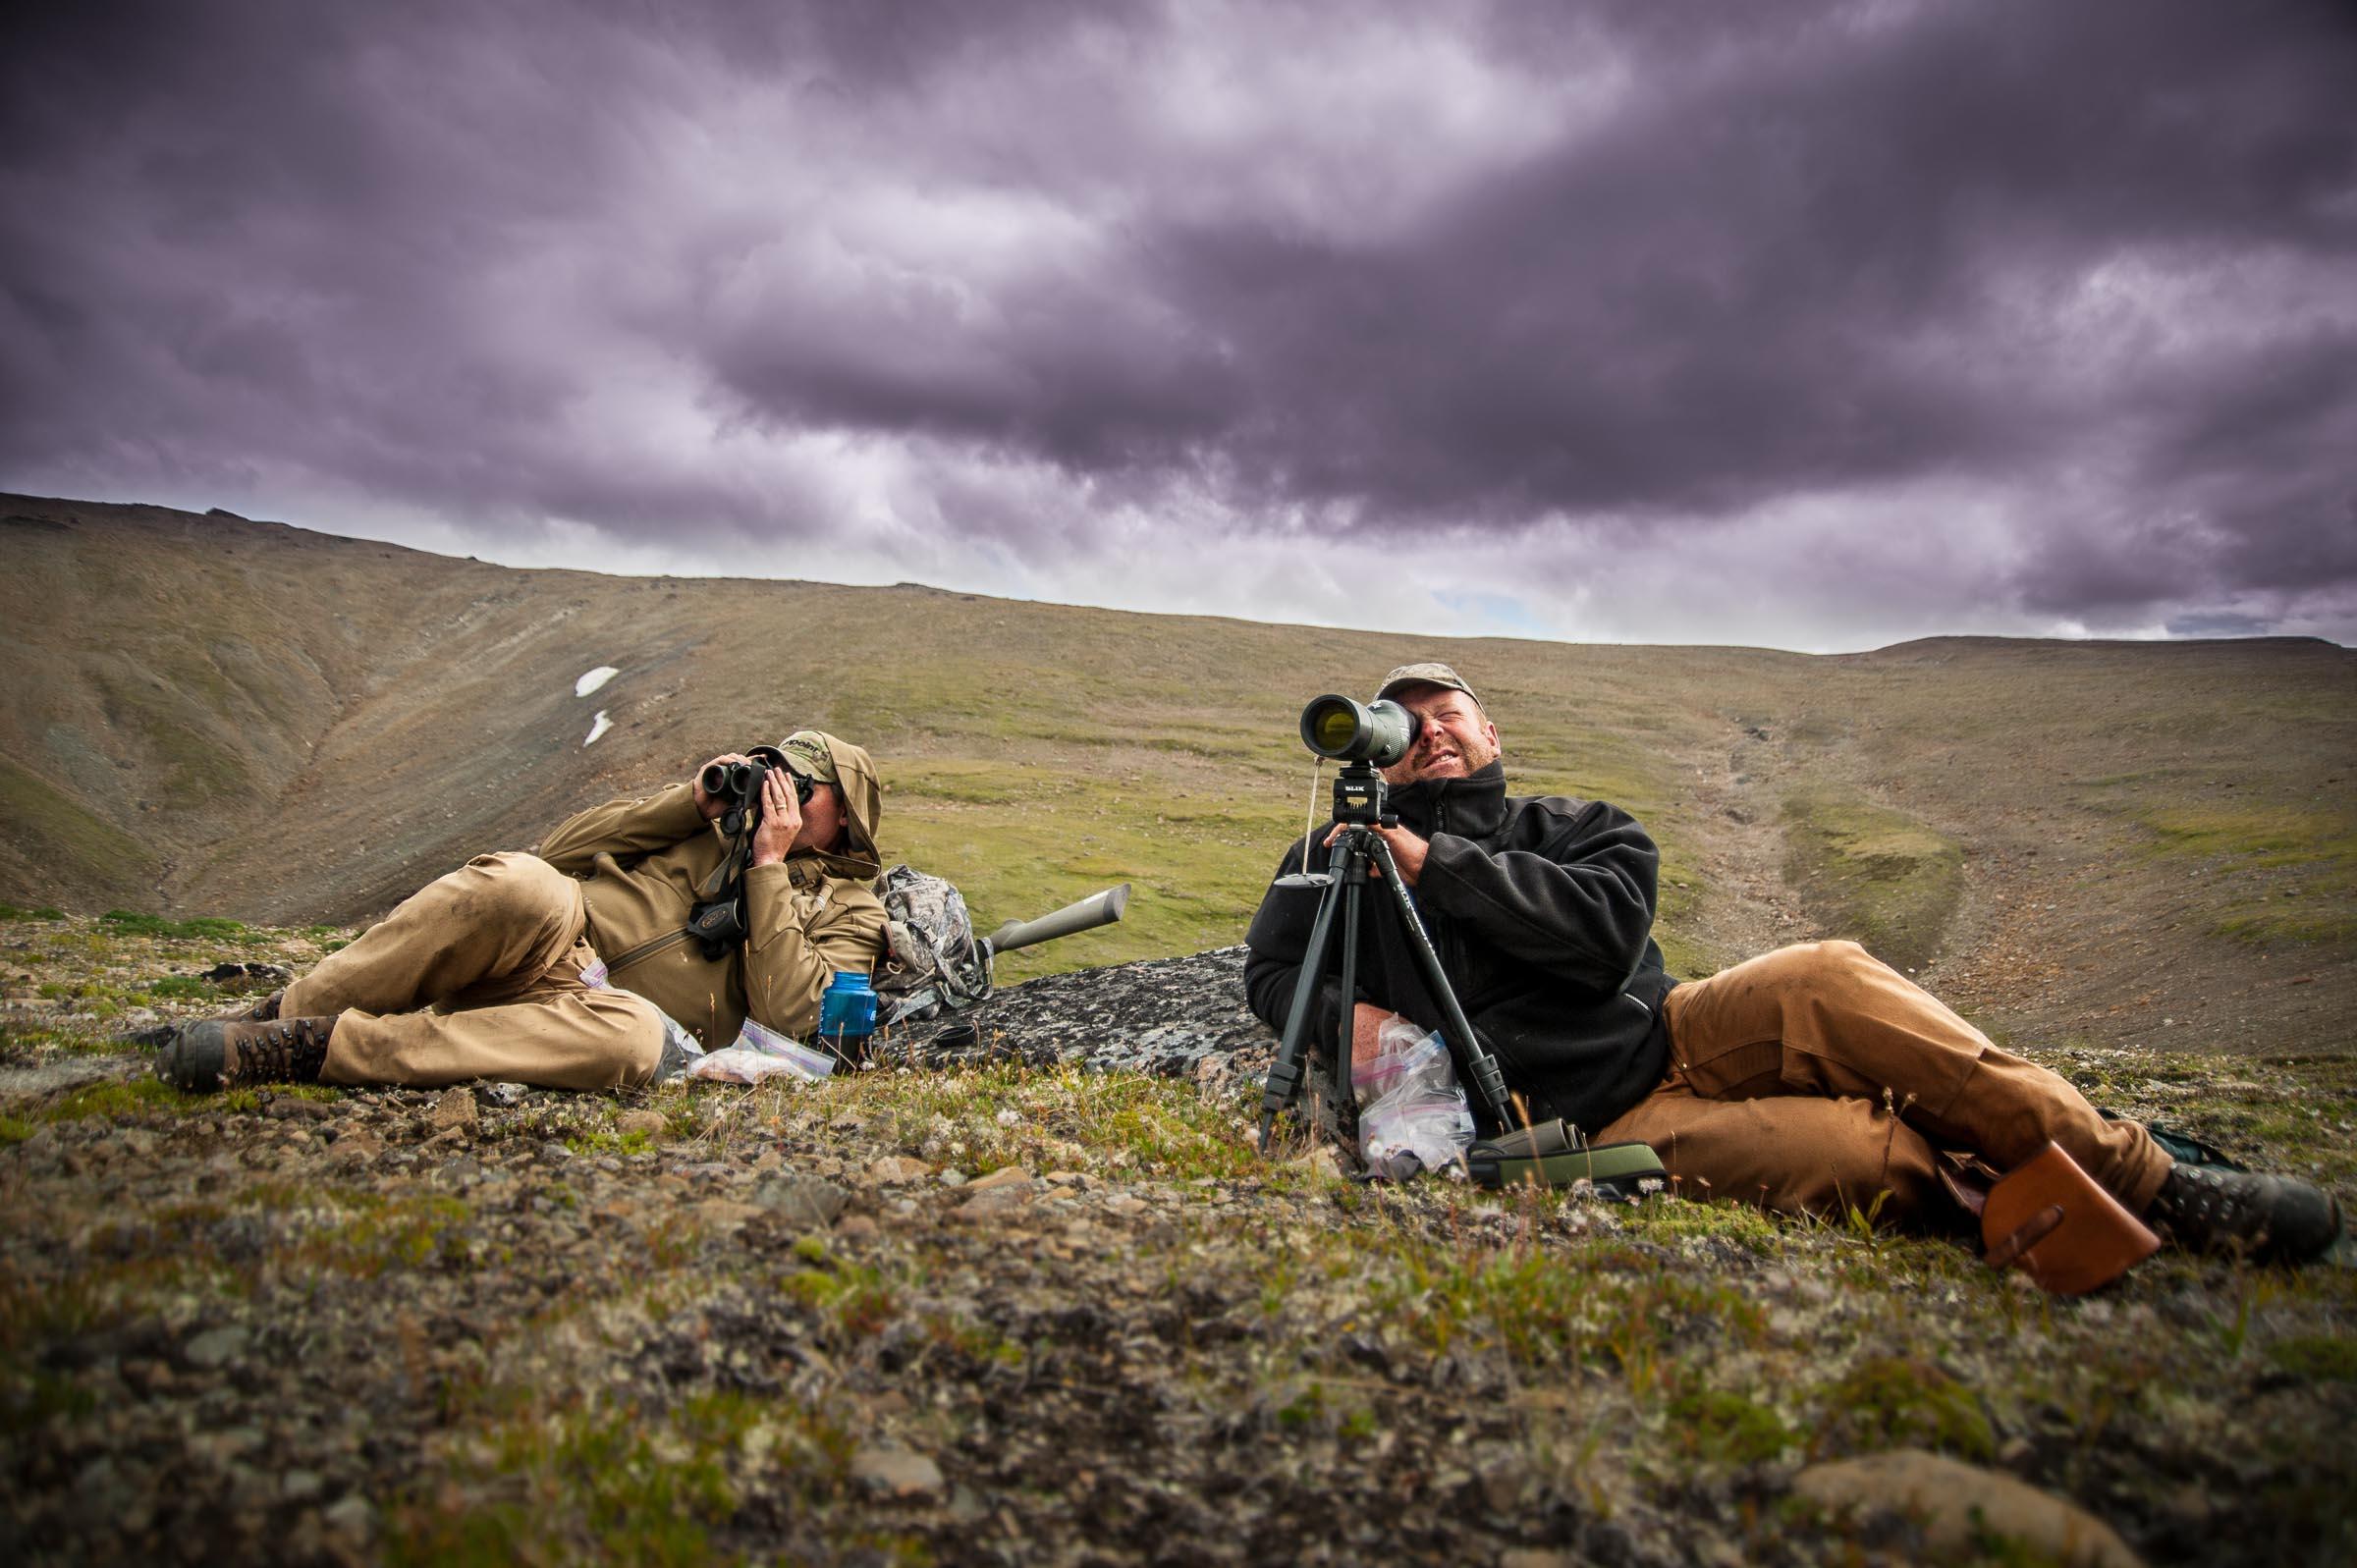 Dall sheep hunting with Swarovski Optics, in Northern British Columbia, Canada. © Tony Bynum